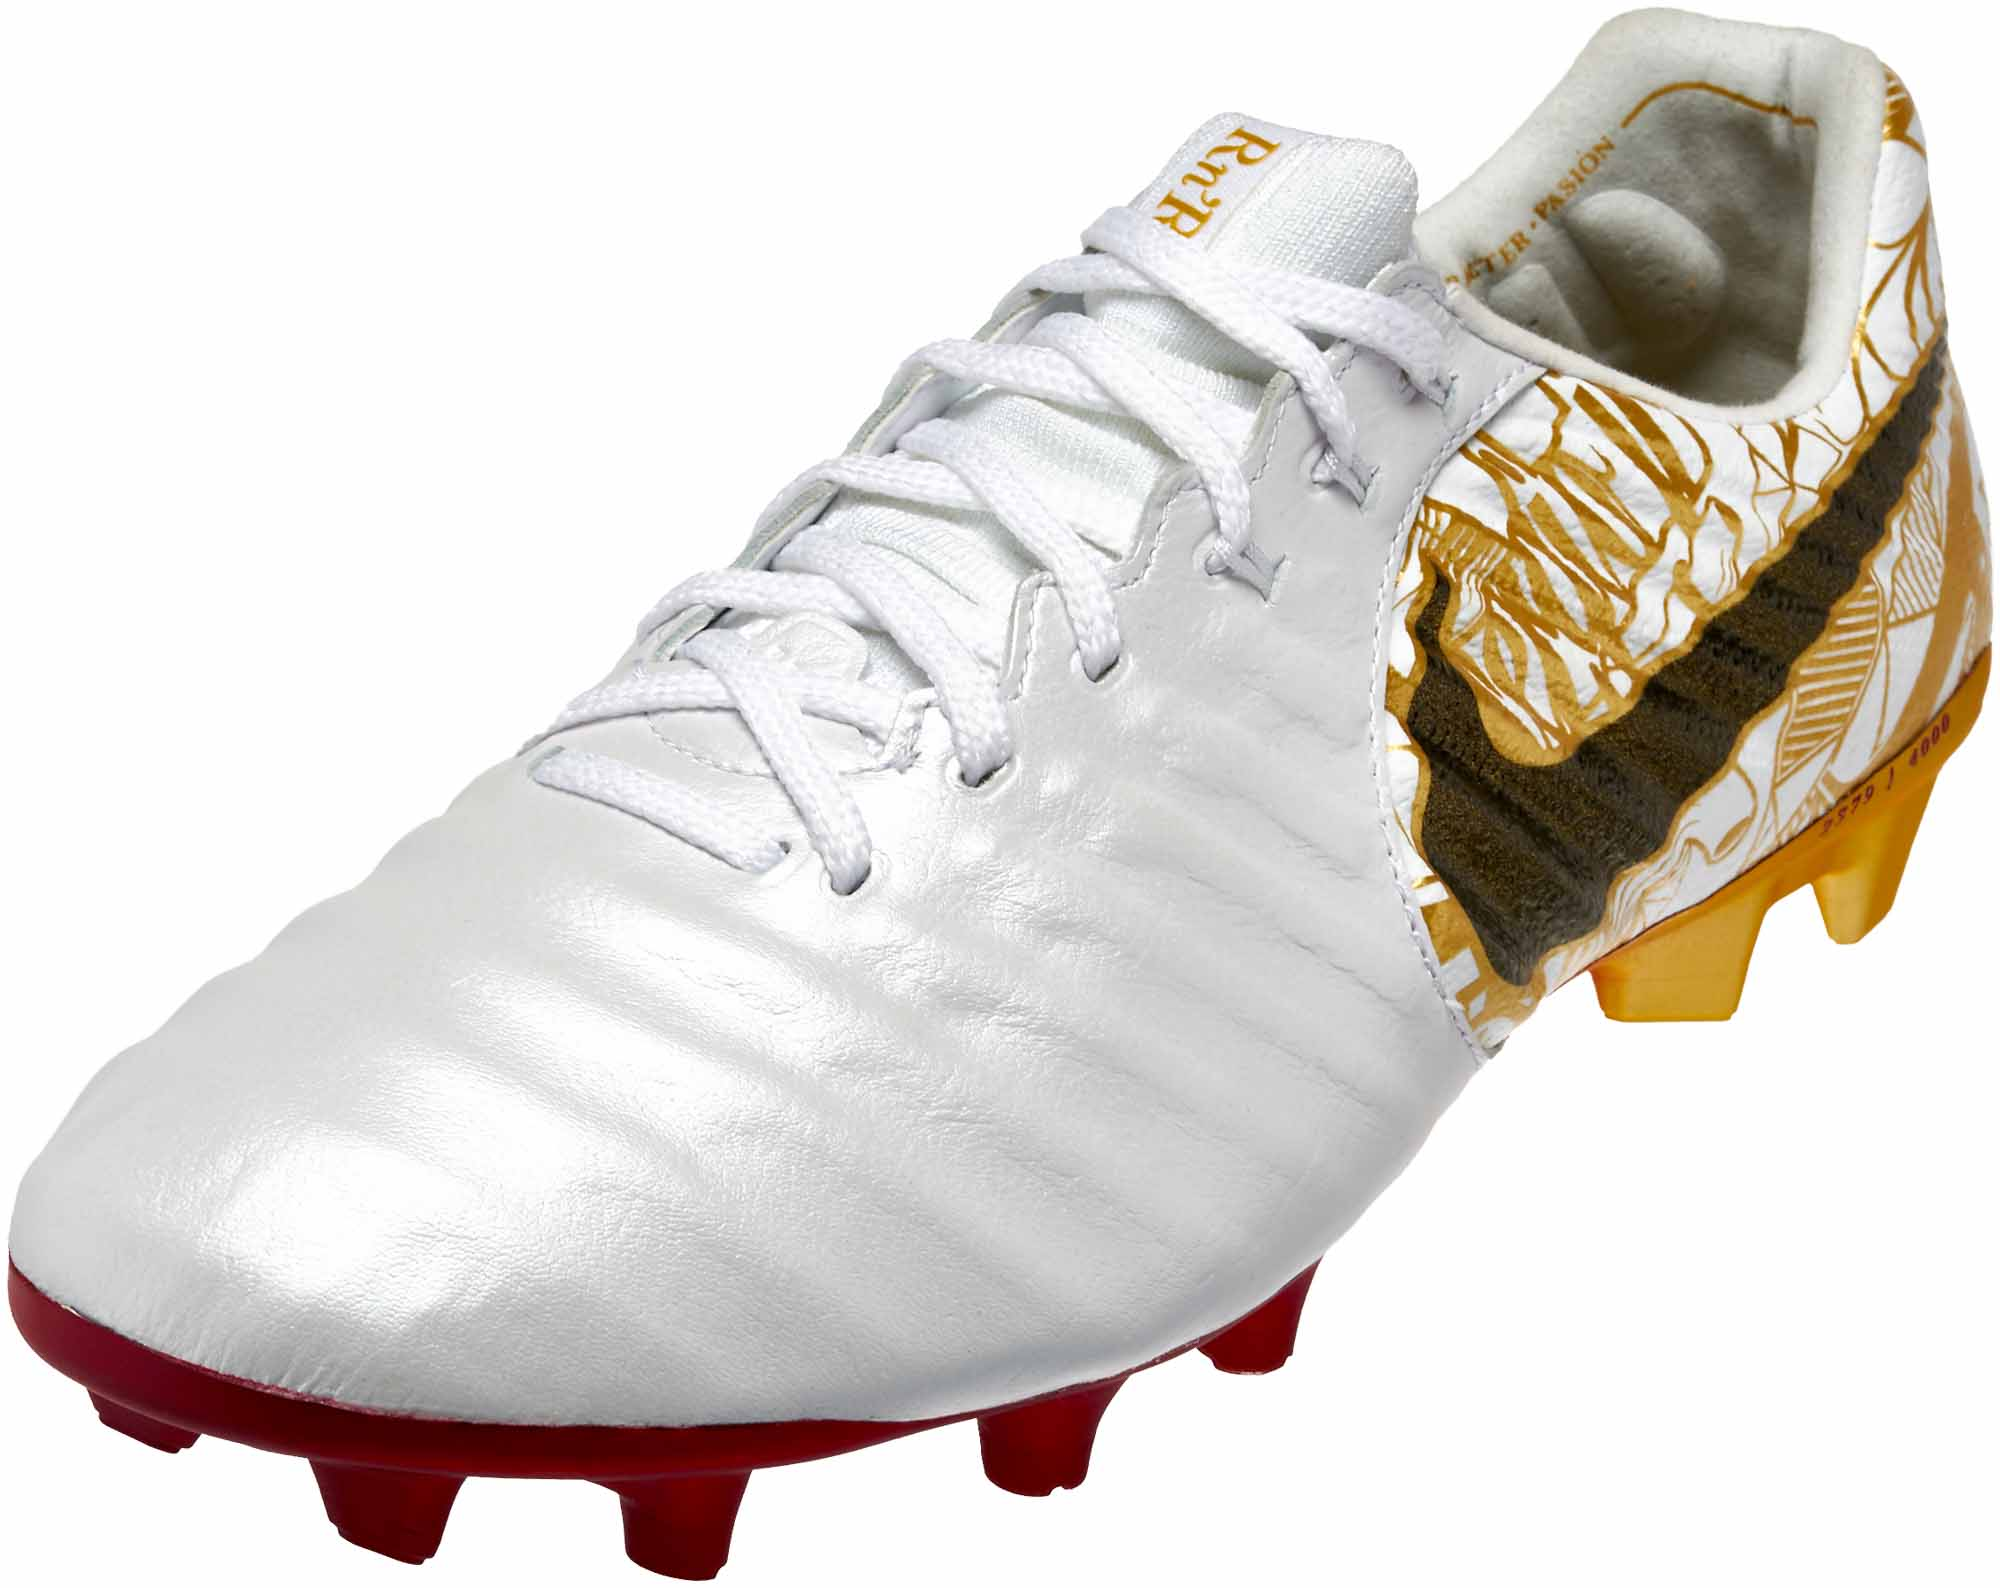 Nike Tiempo Shoes